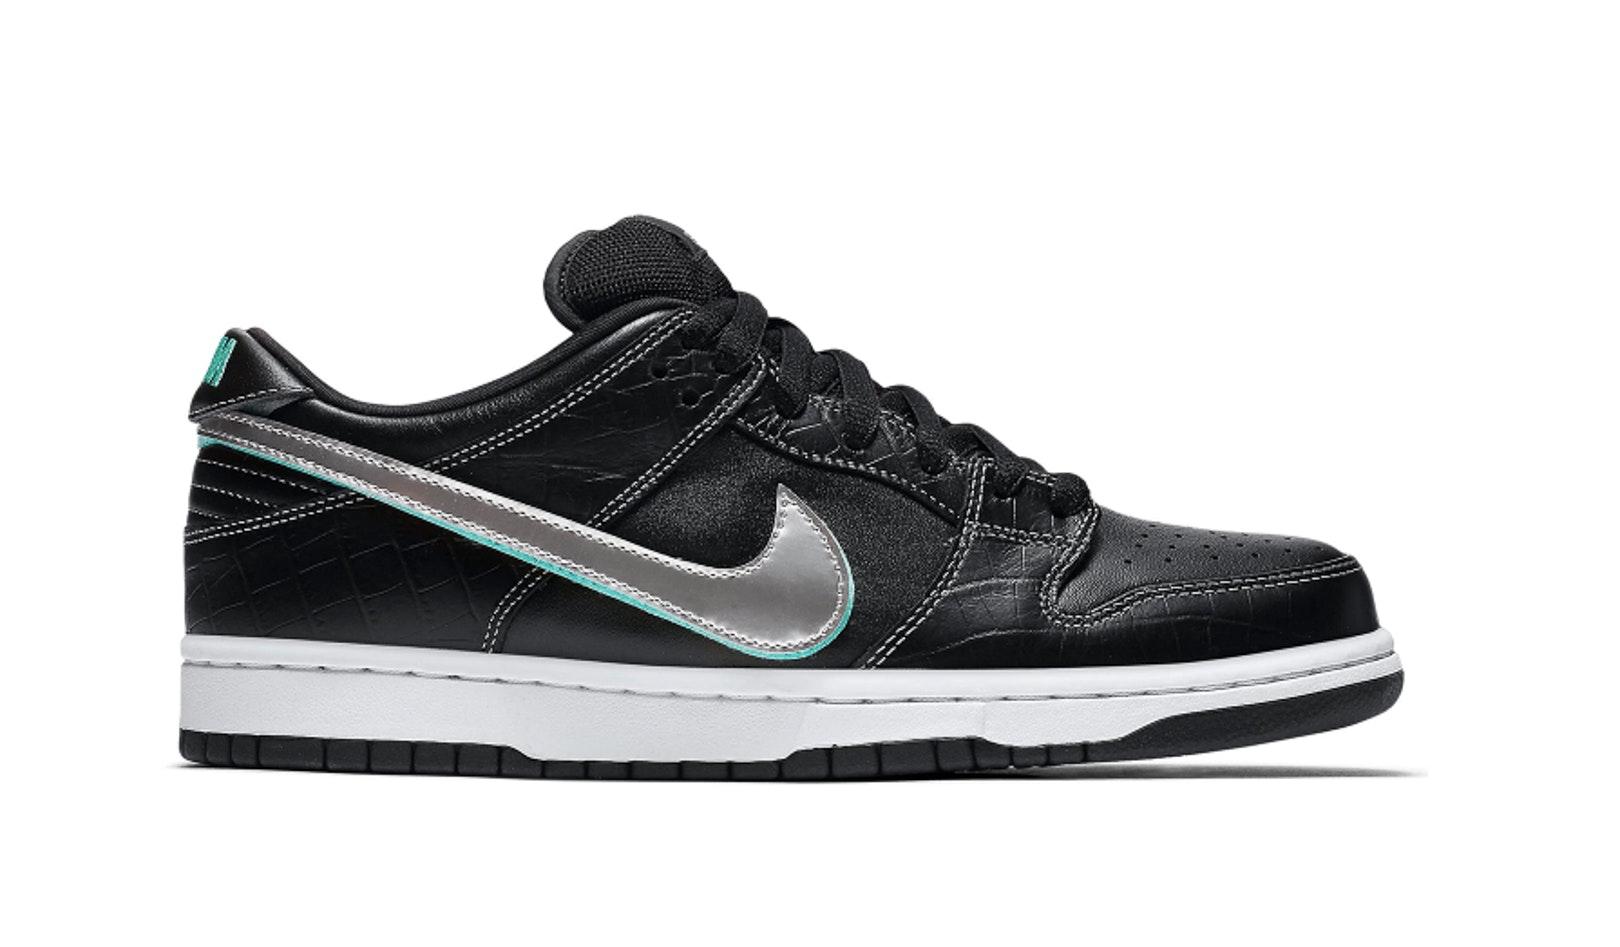 Nike Dunk low Diamond Supply Co